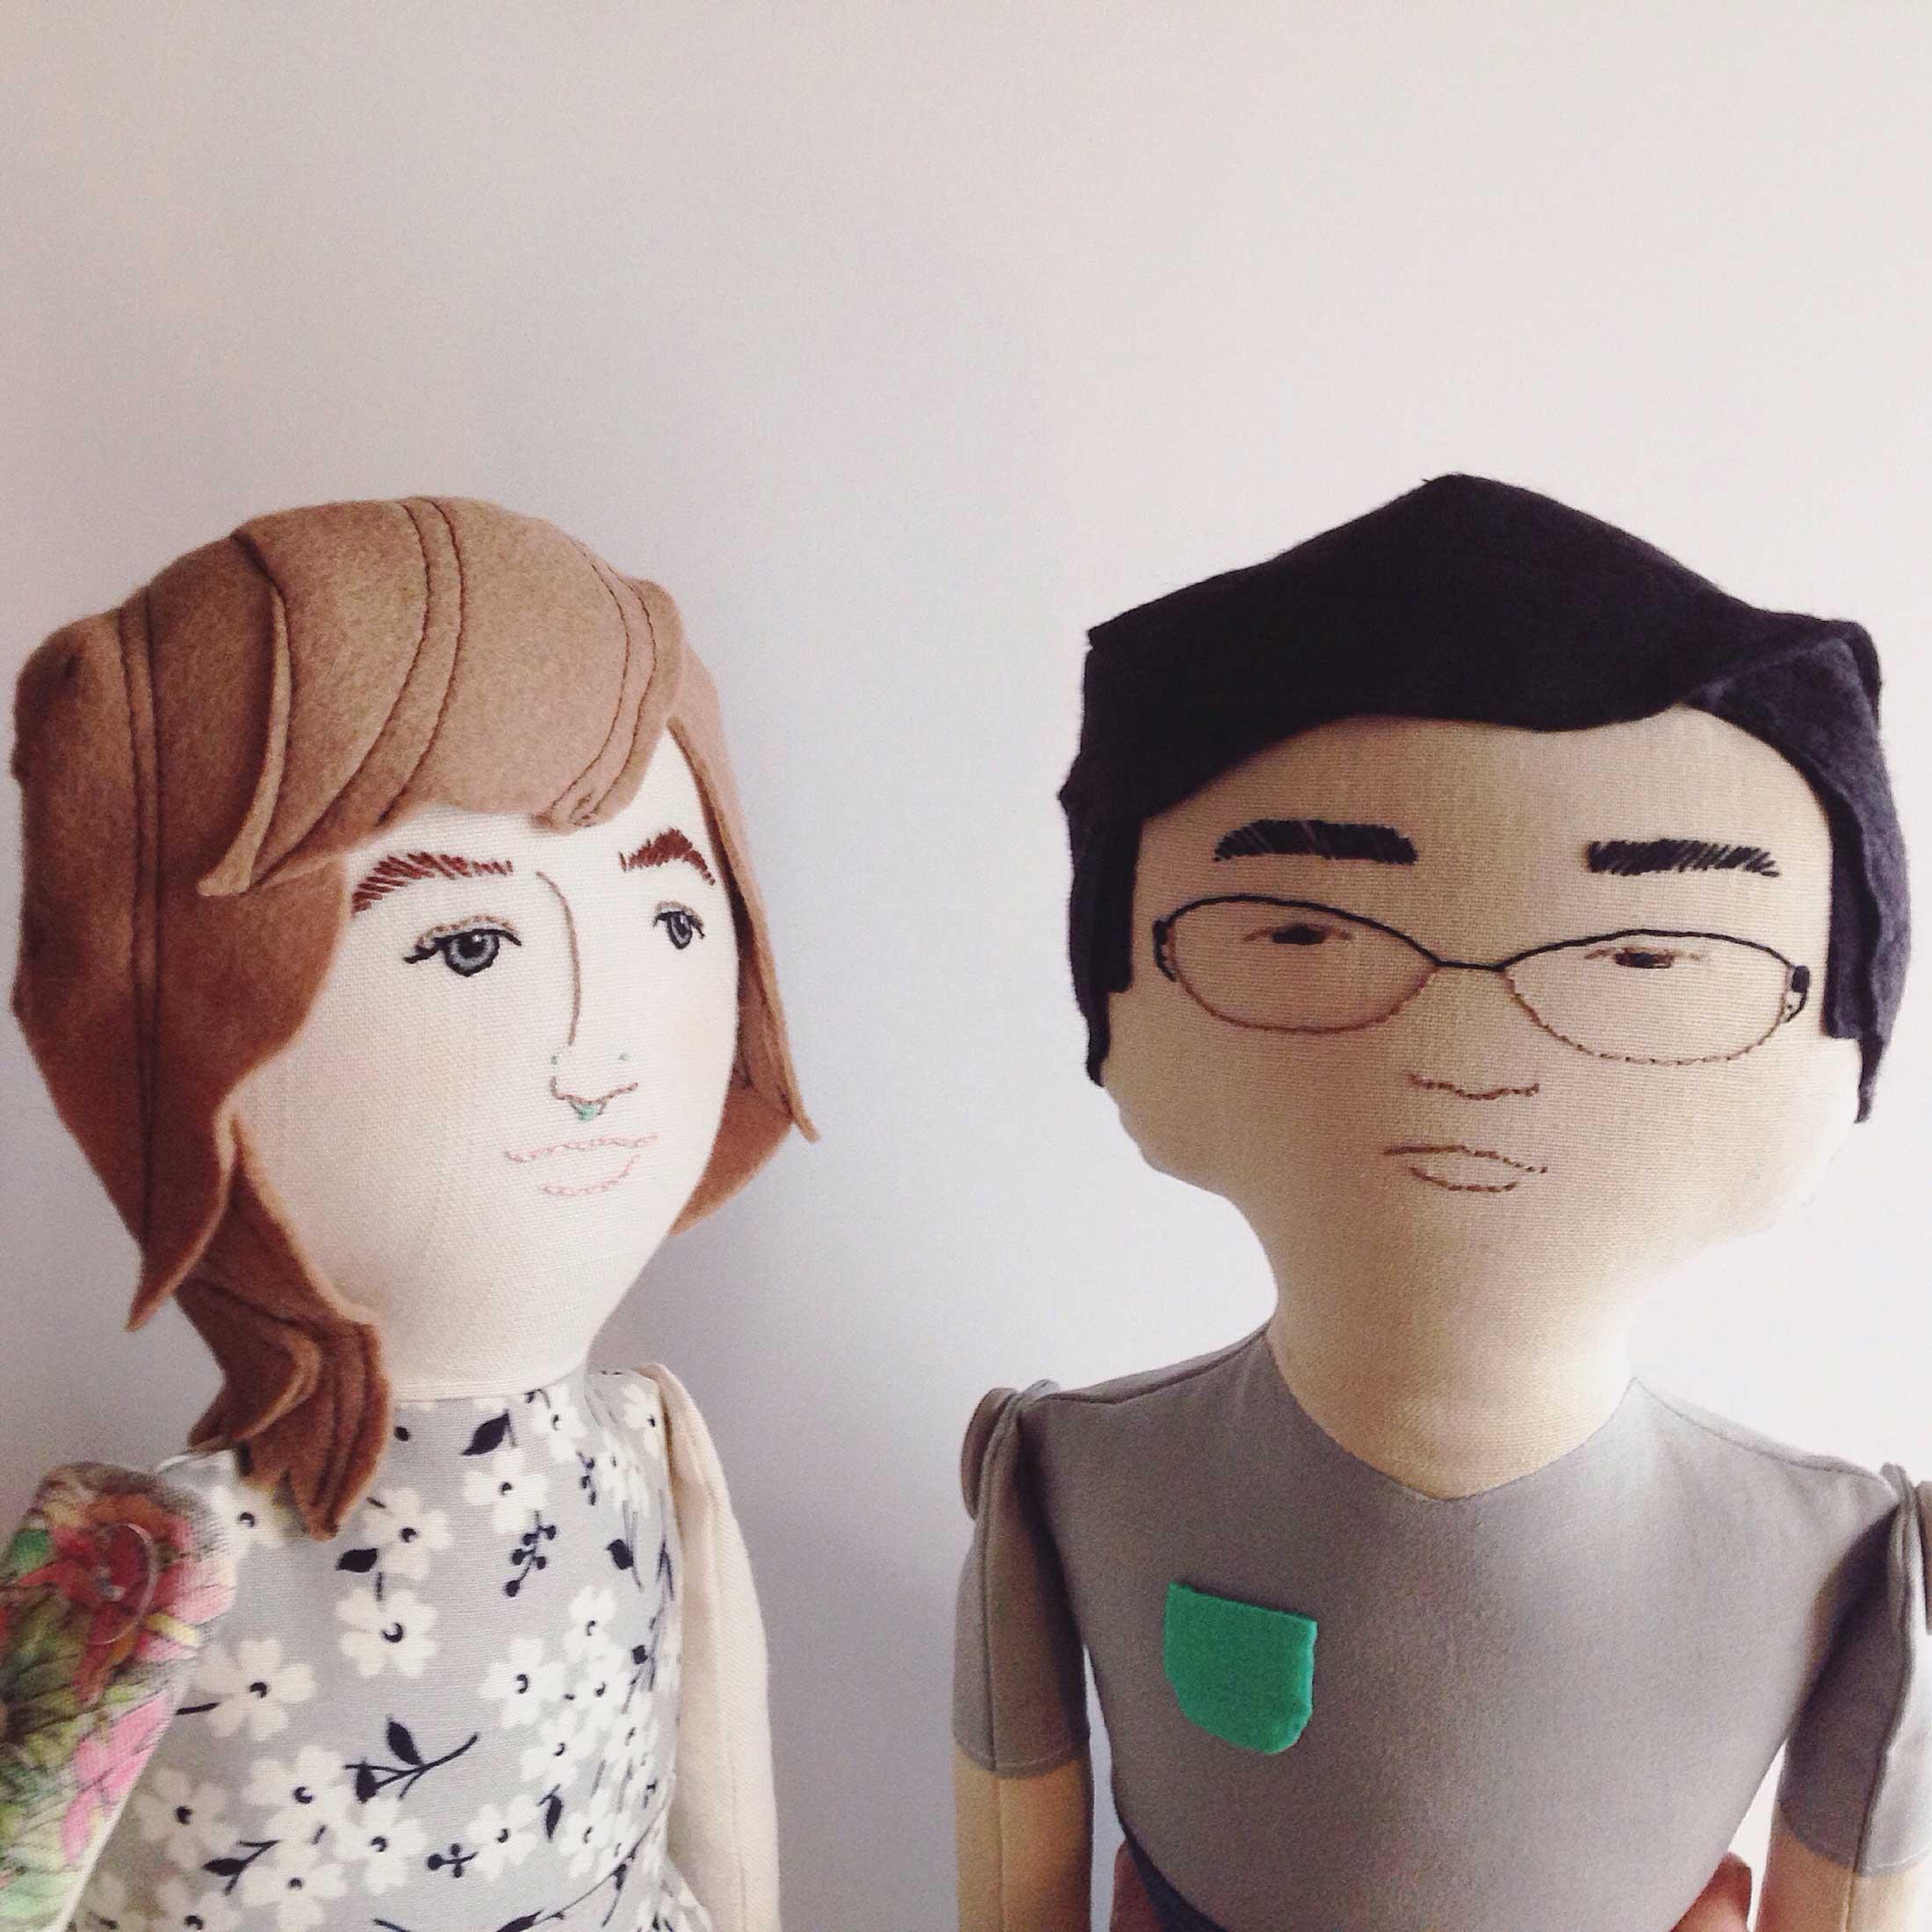 ustom Couple Dolls